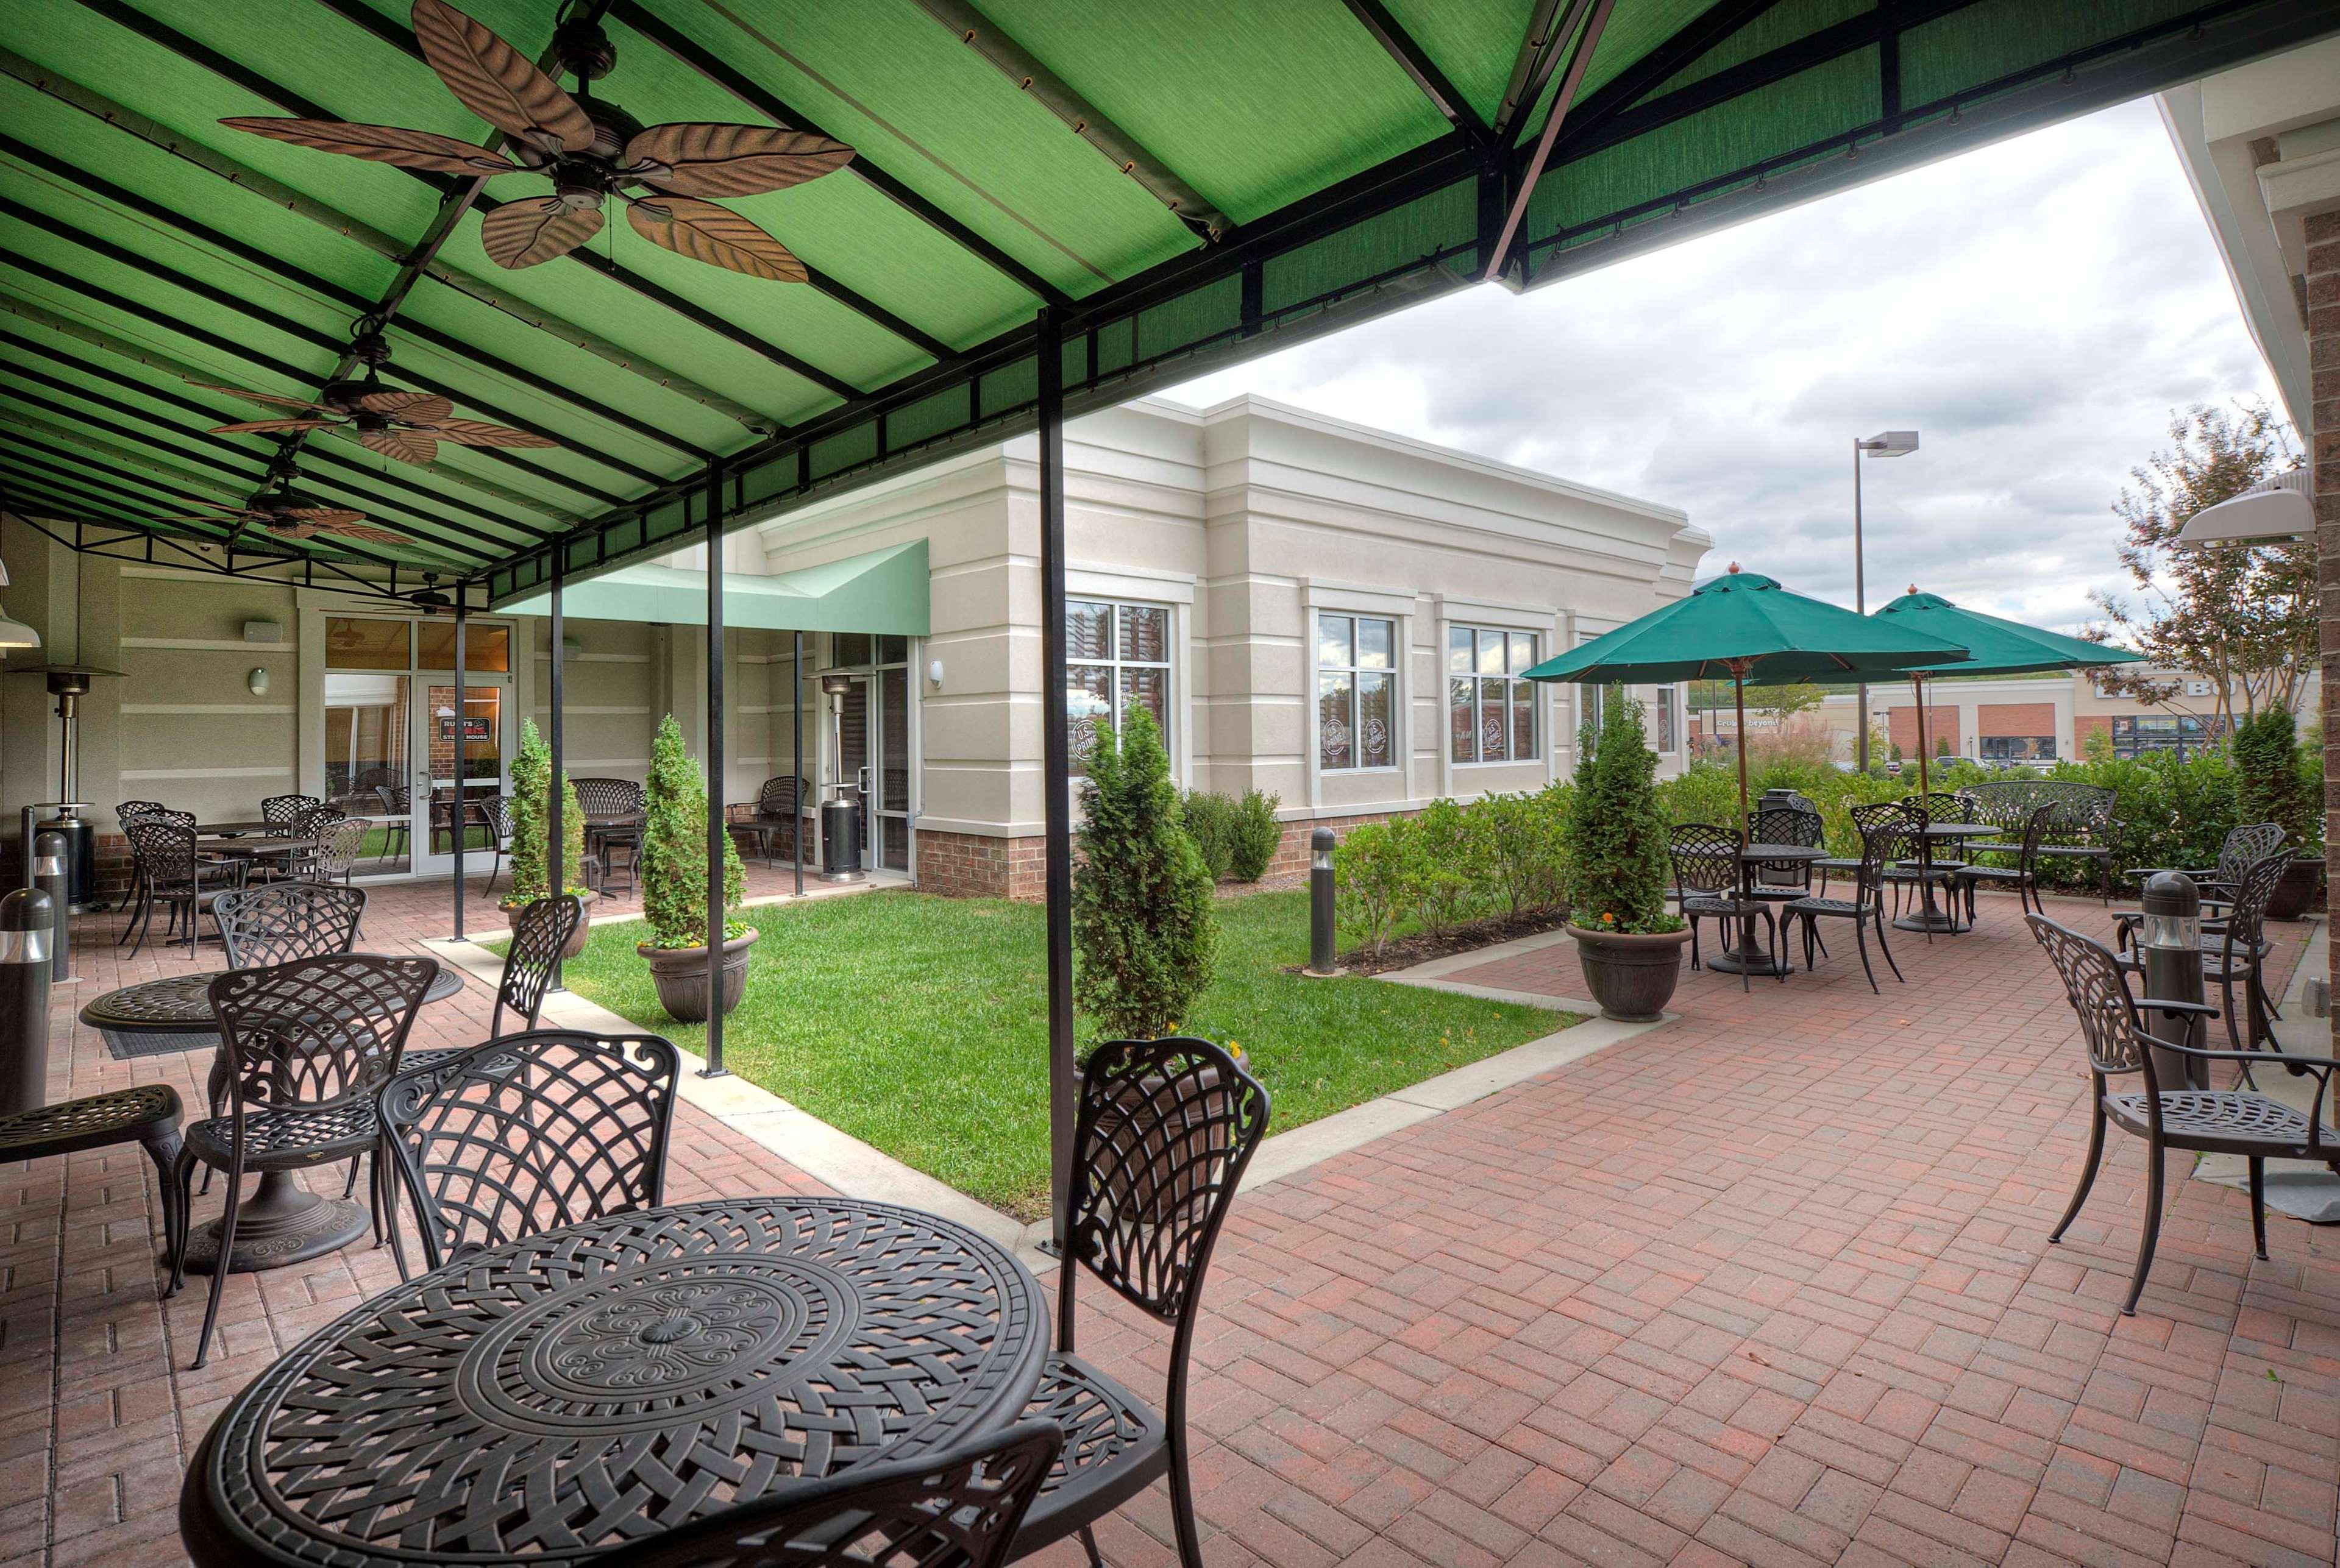 Hilton Garden Inn Durham Southpoint image 47